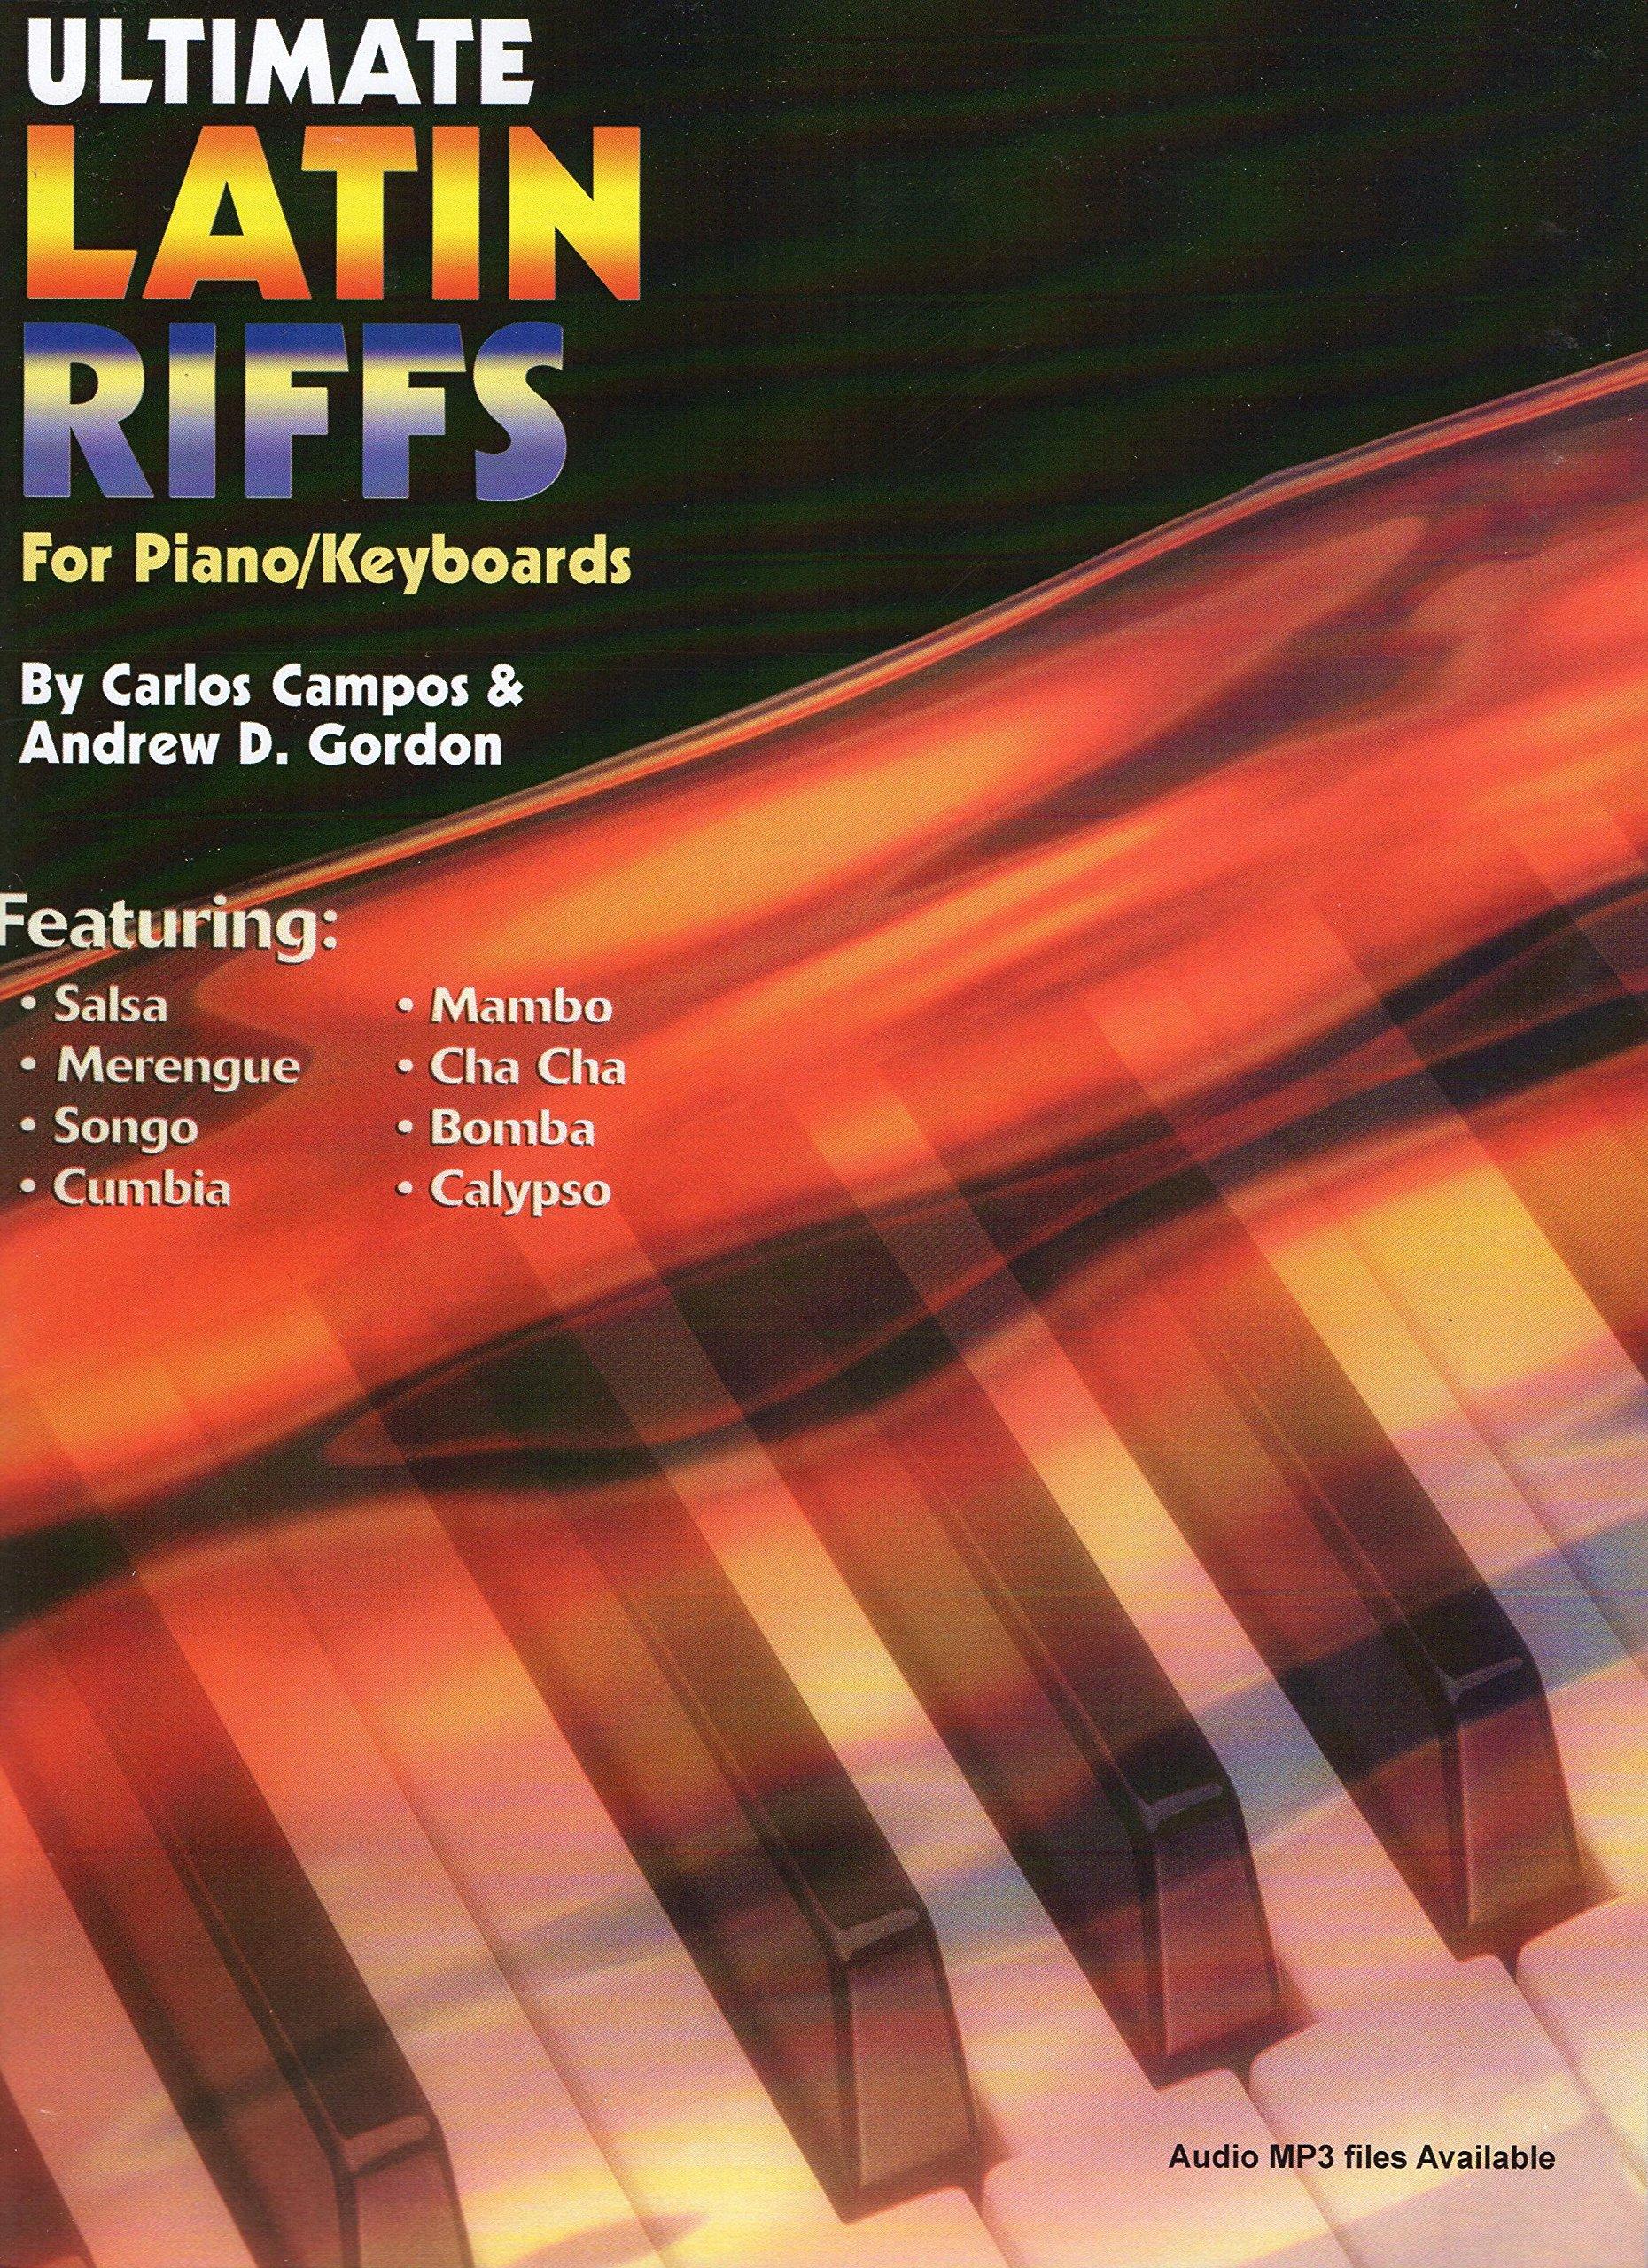 Ultimate Latin Piano/Keyboard Riffs Book/audio files: Andrew